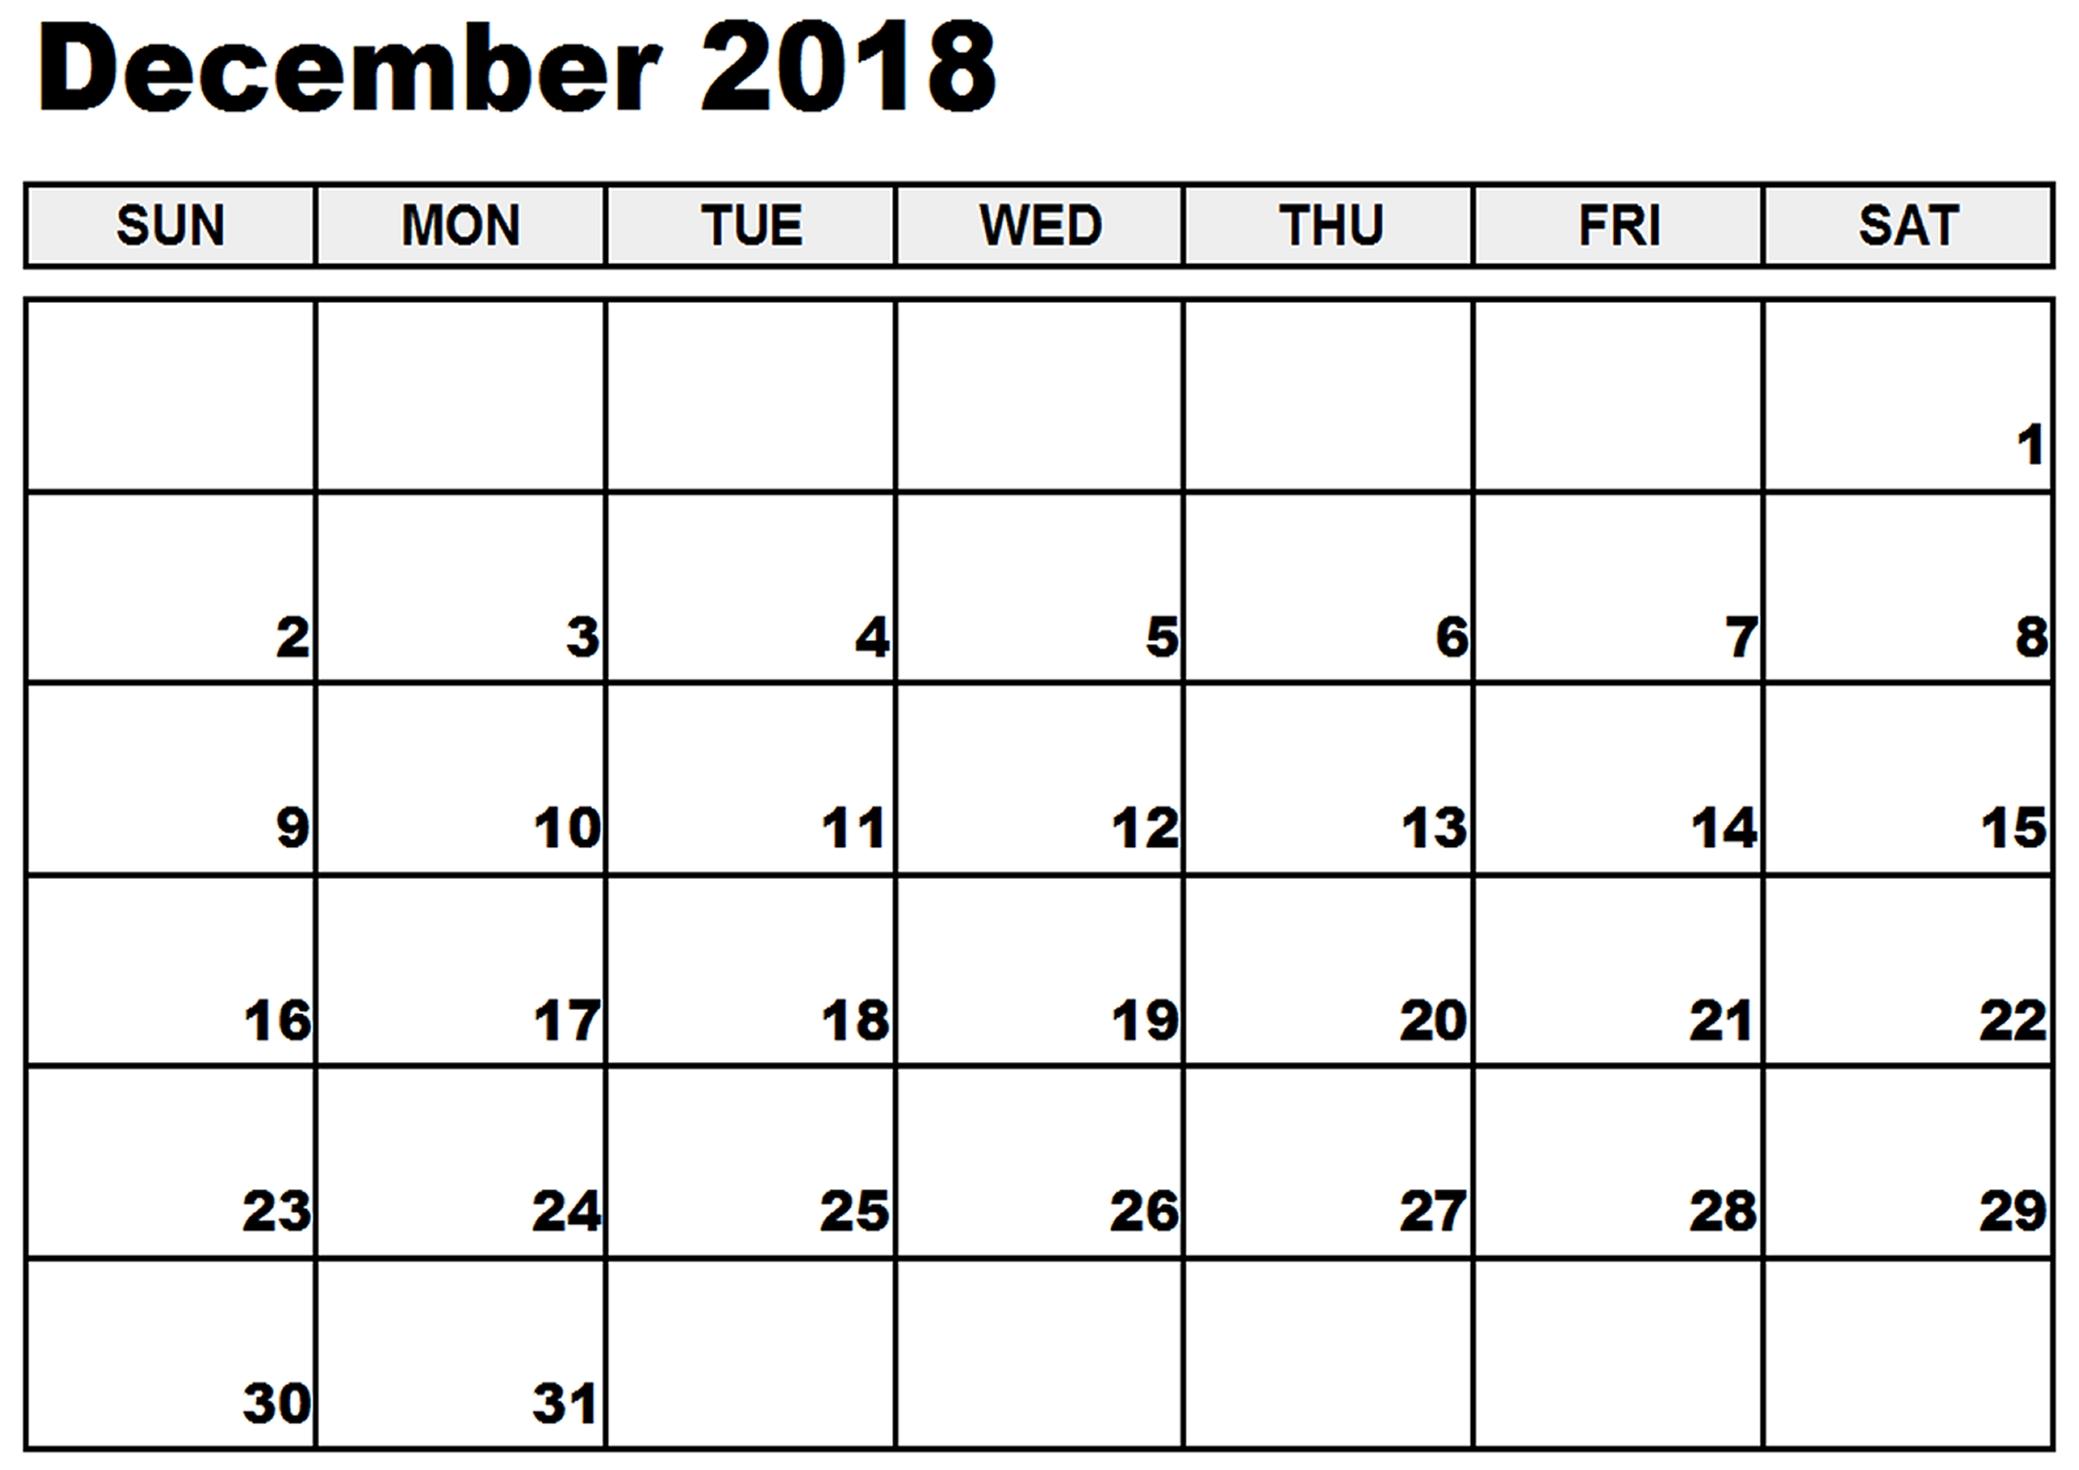 December 2018 Calendar Printable